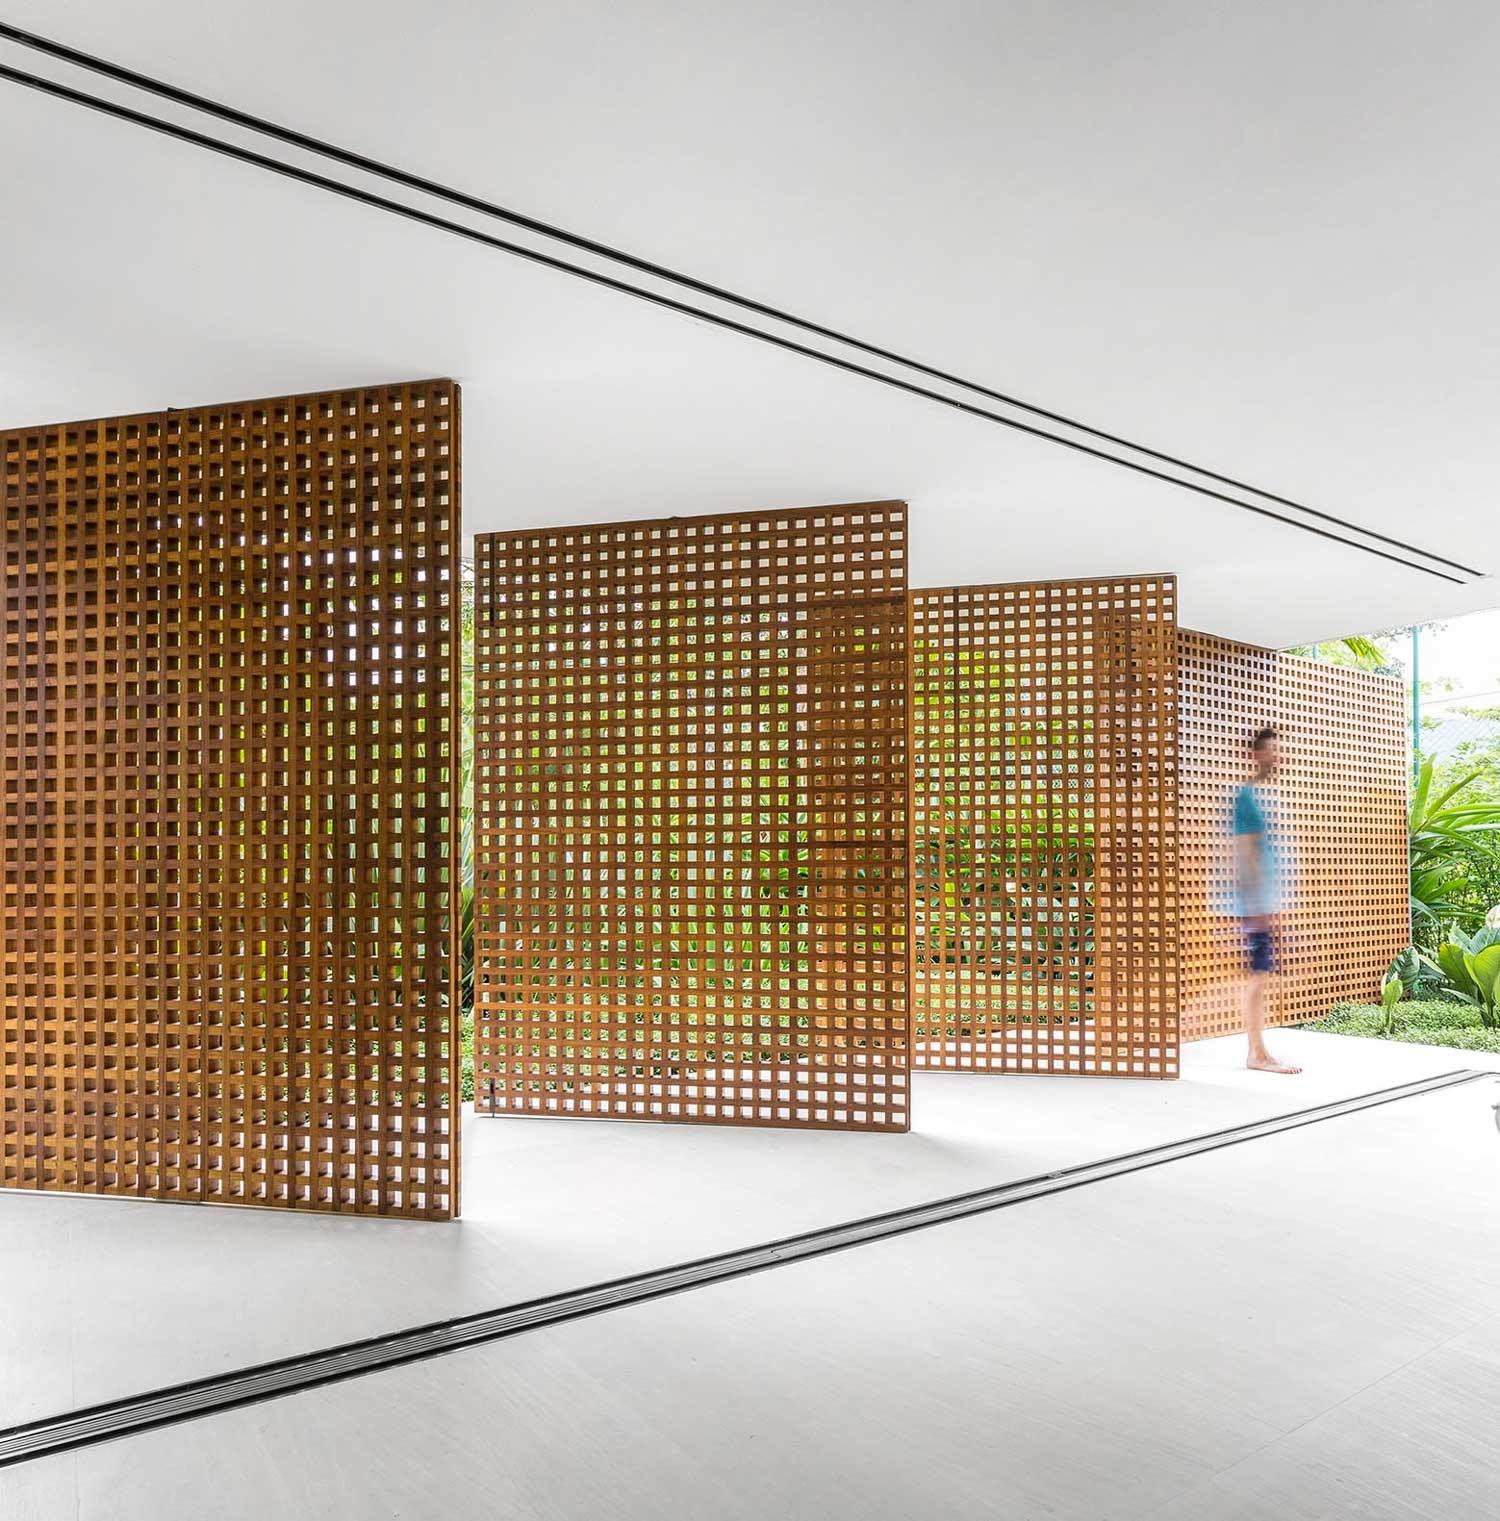 Casa Branca by Studio MK27 | Yellowtrace